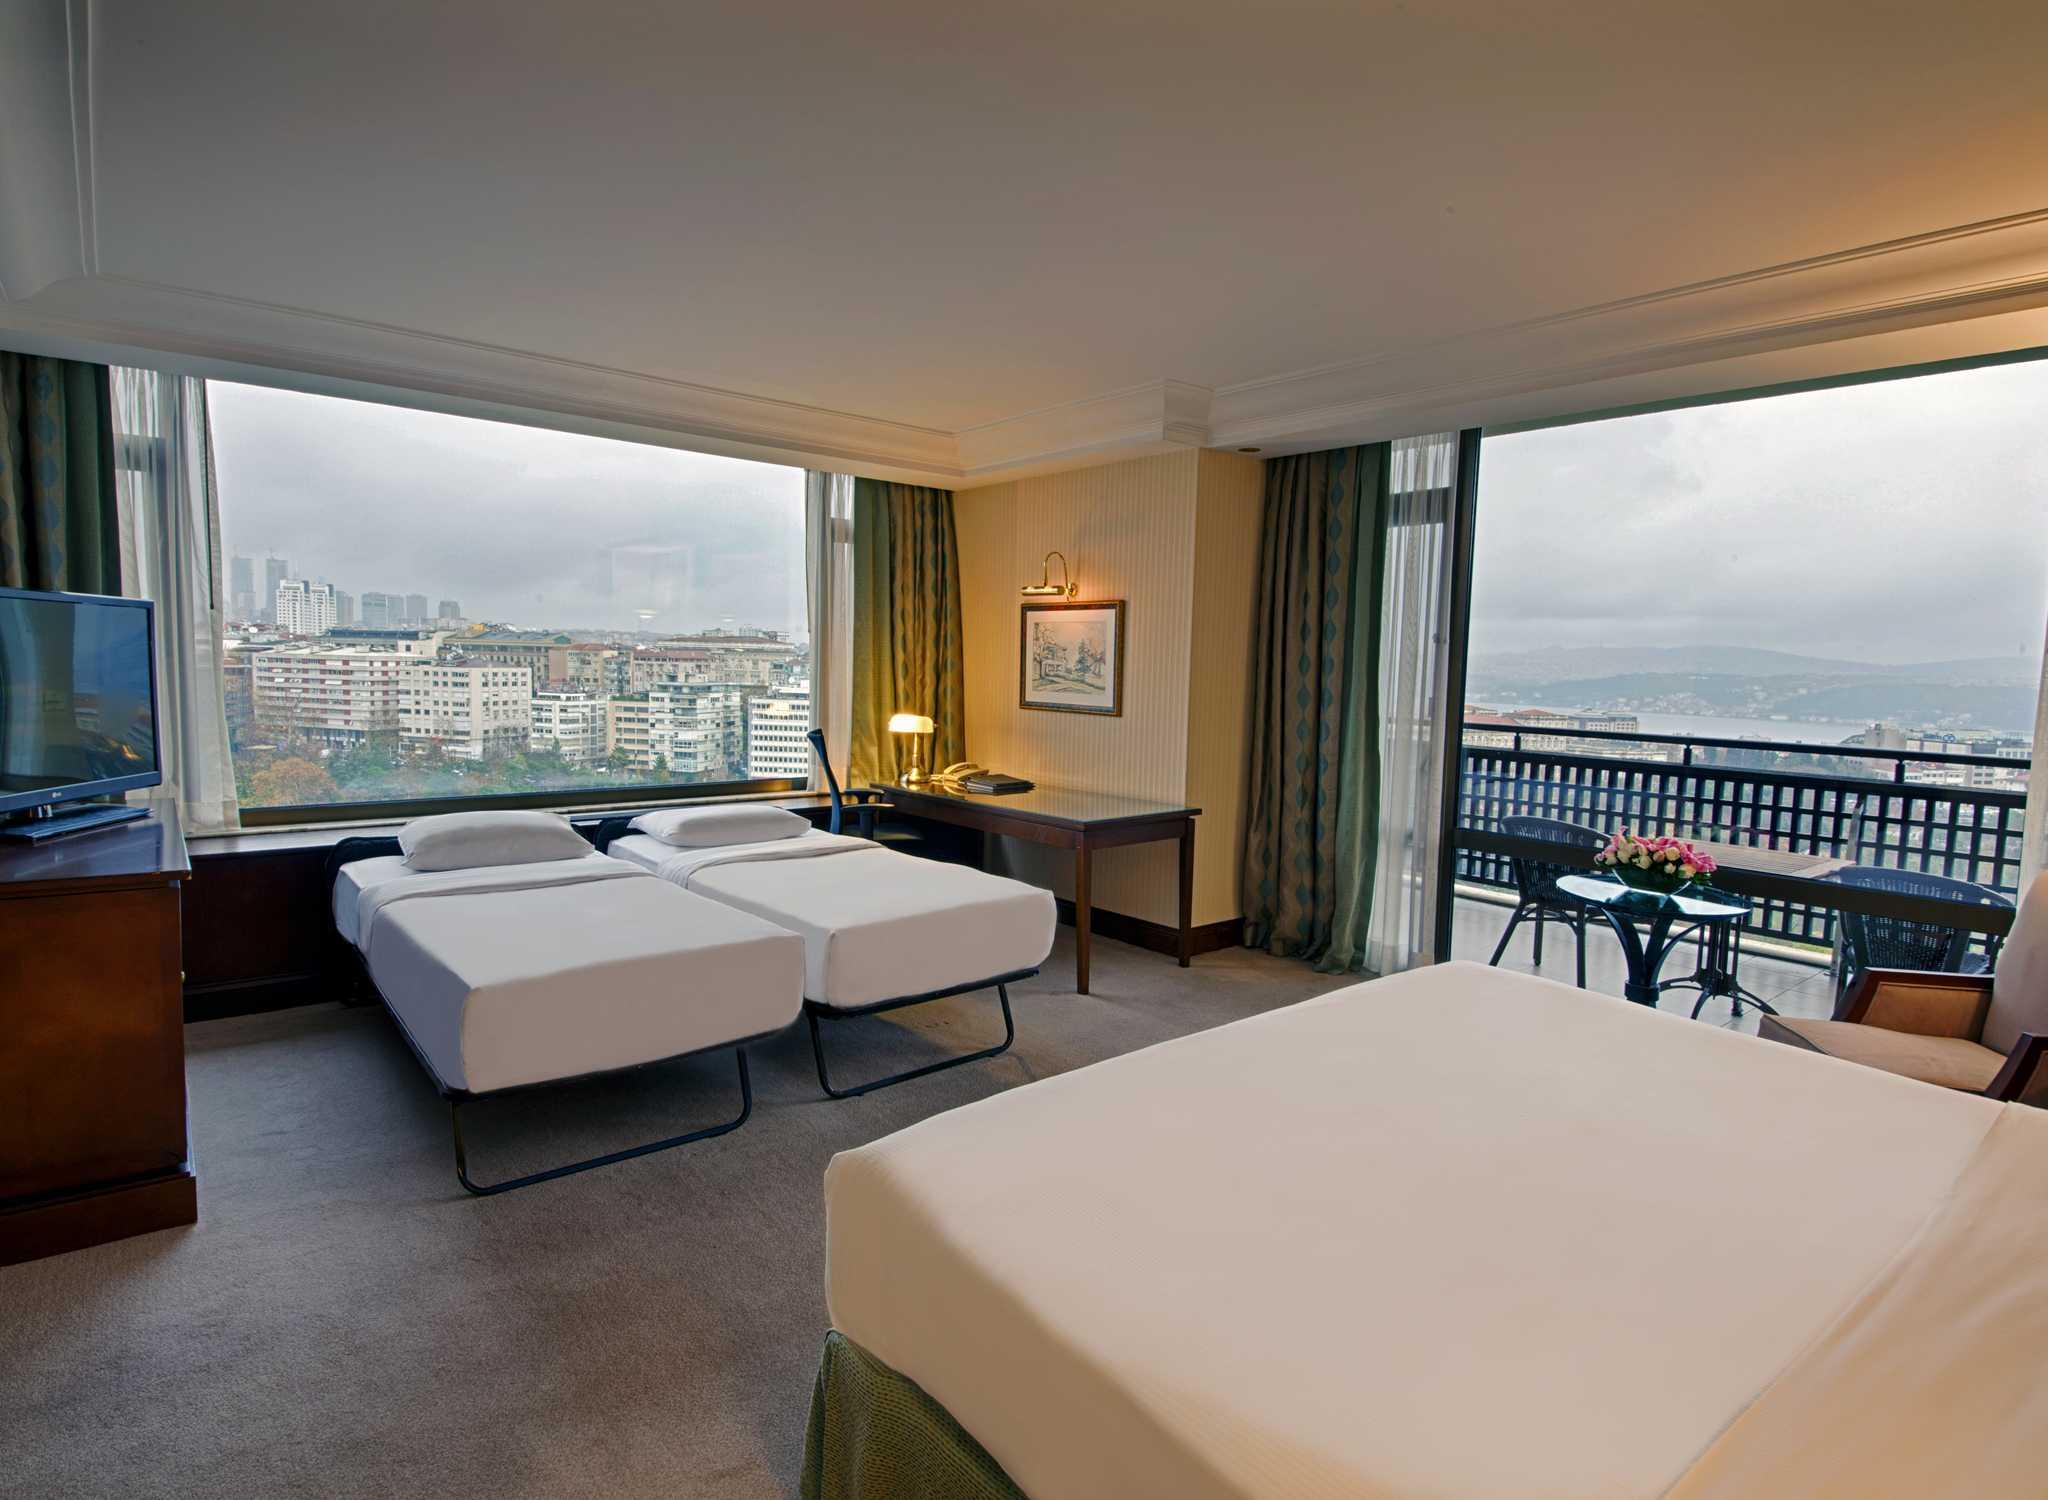 Luxury Hotels In Istanbul Turkey Hilton Istanbul